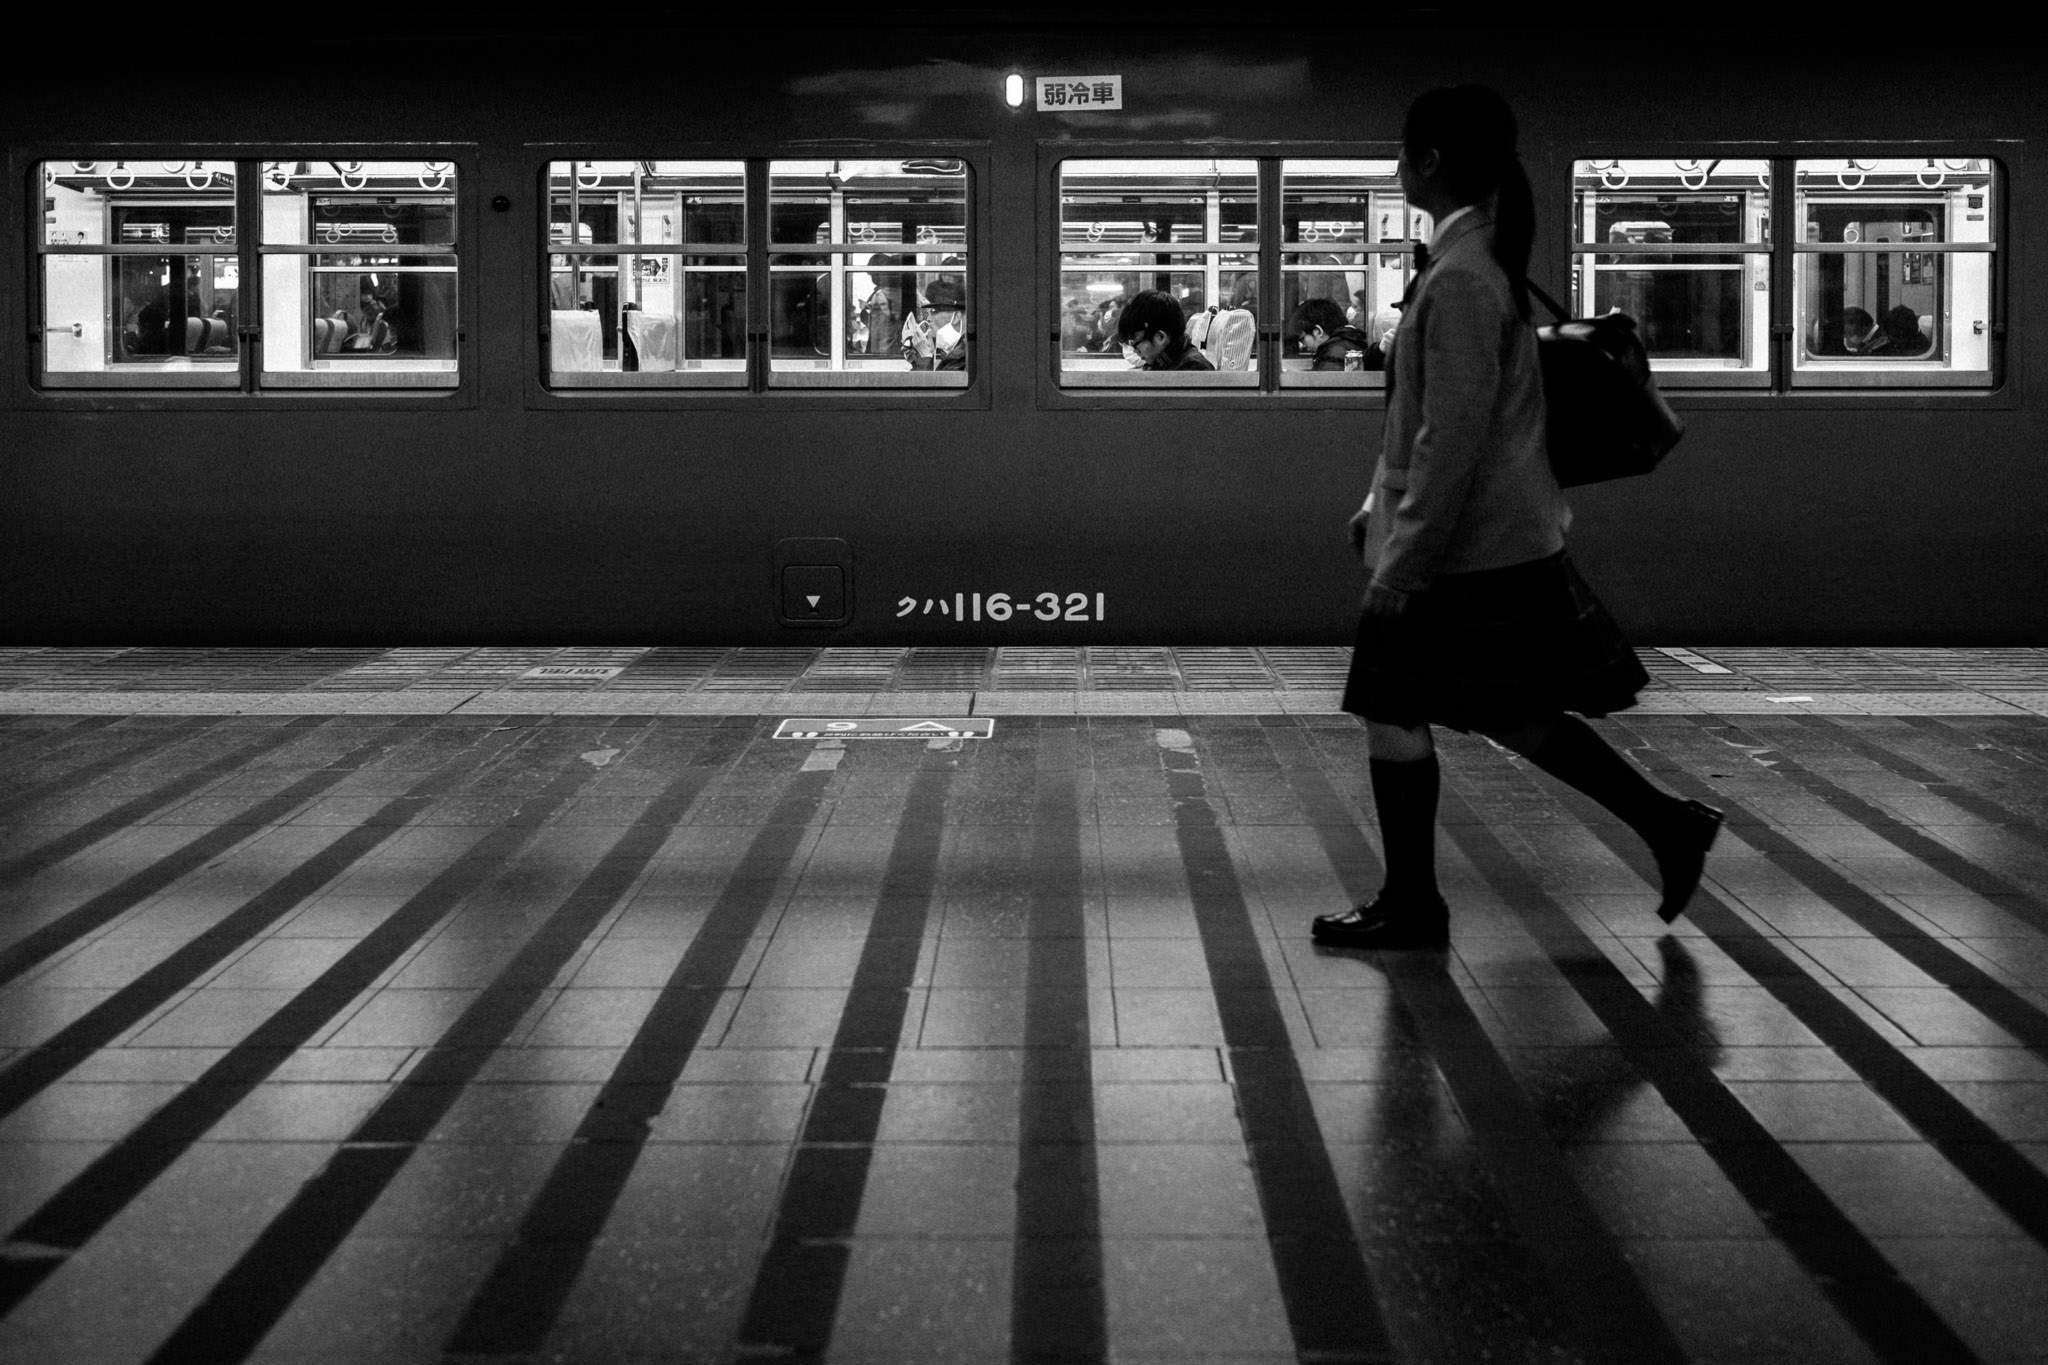 chris_eberhardt_japan_travel_reise_nippon-60.jpg